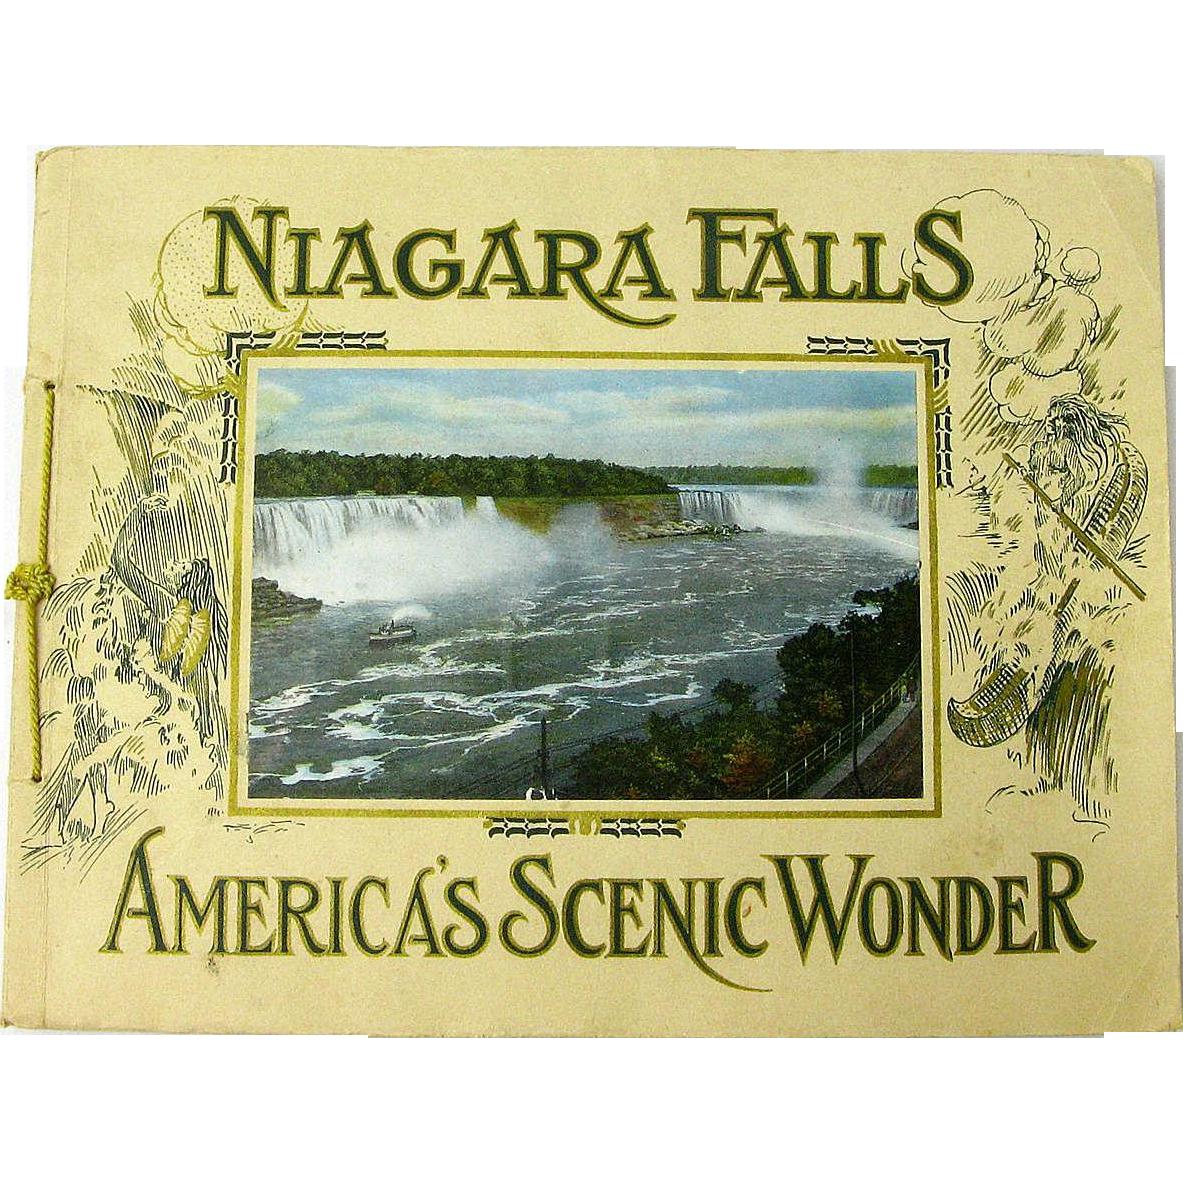 Niagara Falls, America's Scenic Wonder, Souvenir Booklet, Ca. 1910